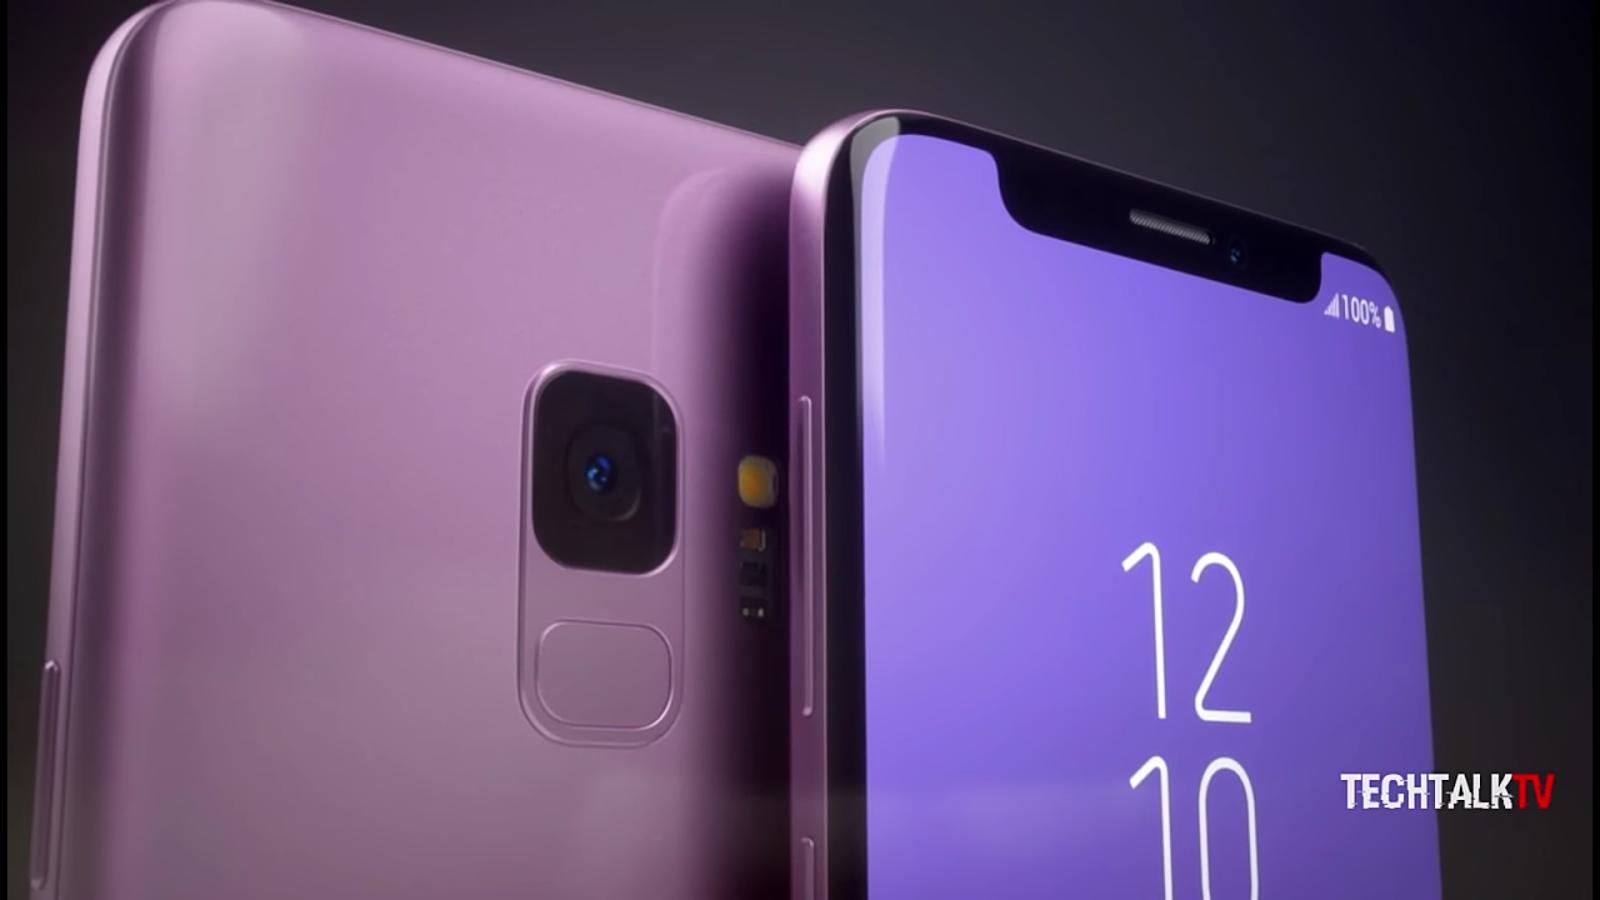 Samsung Galaxy S9 With a Notch